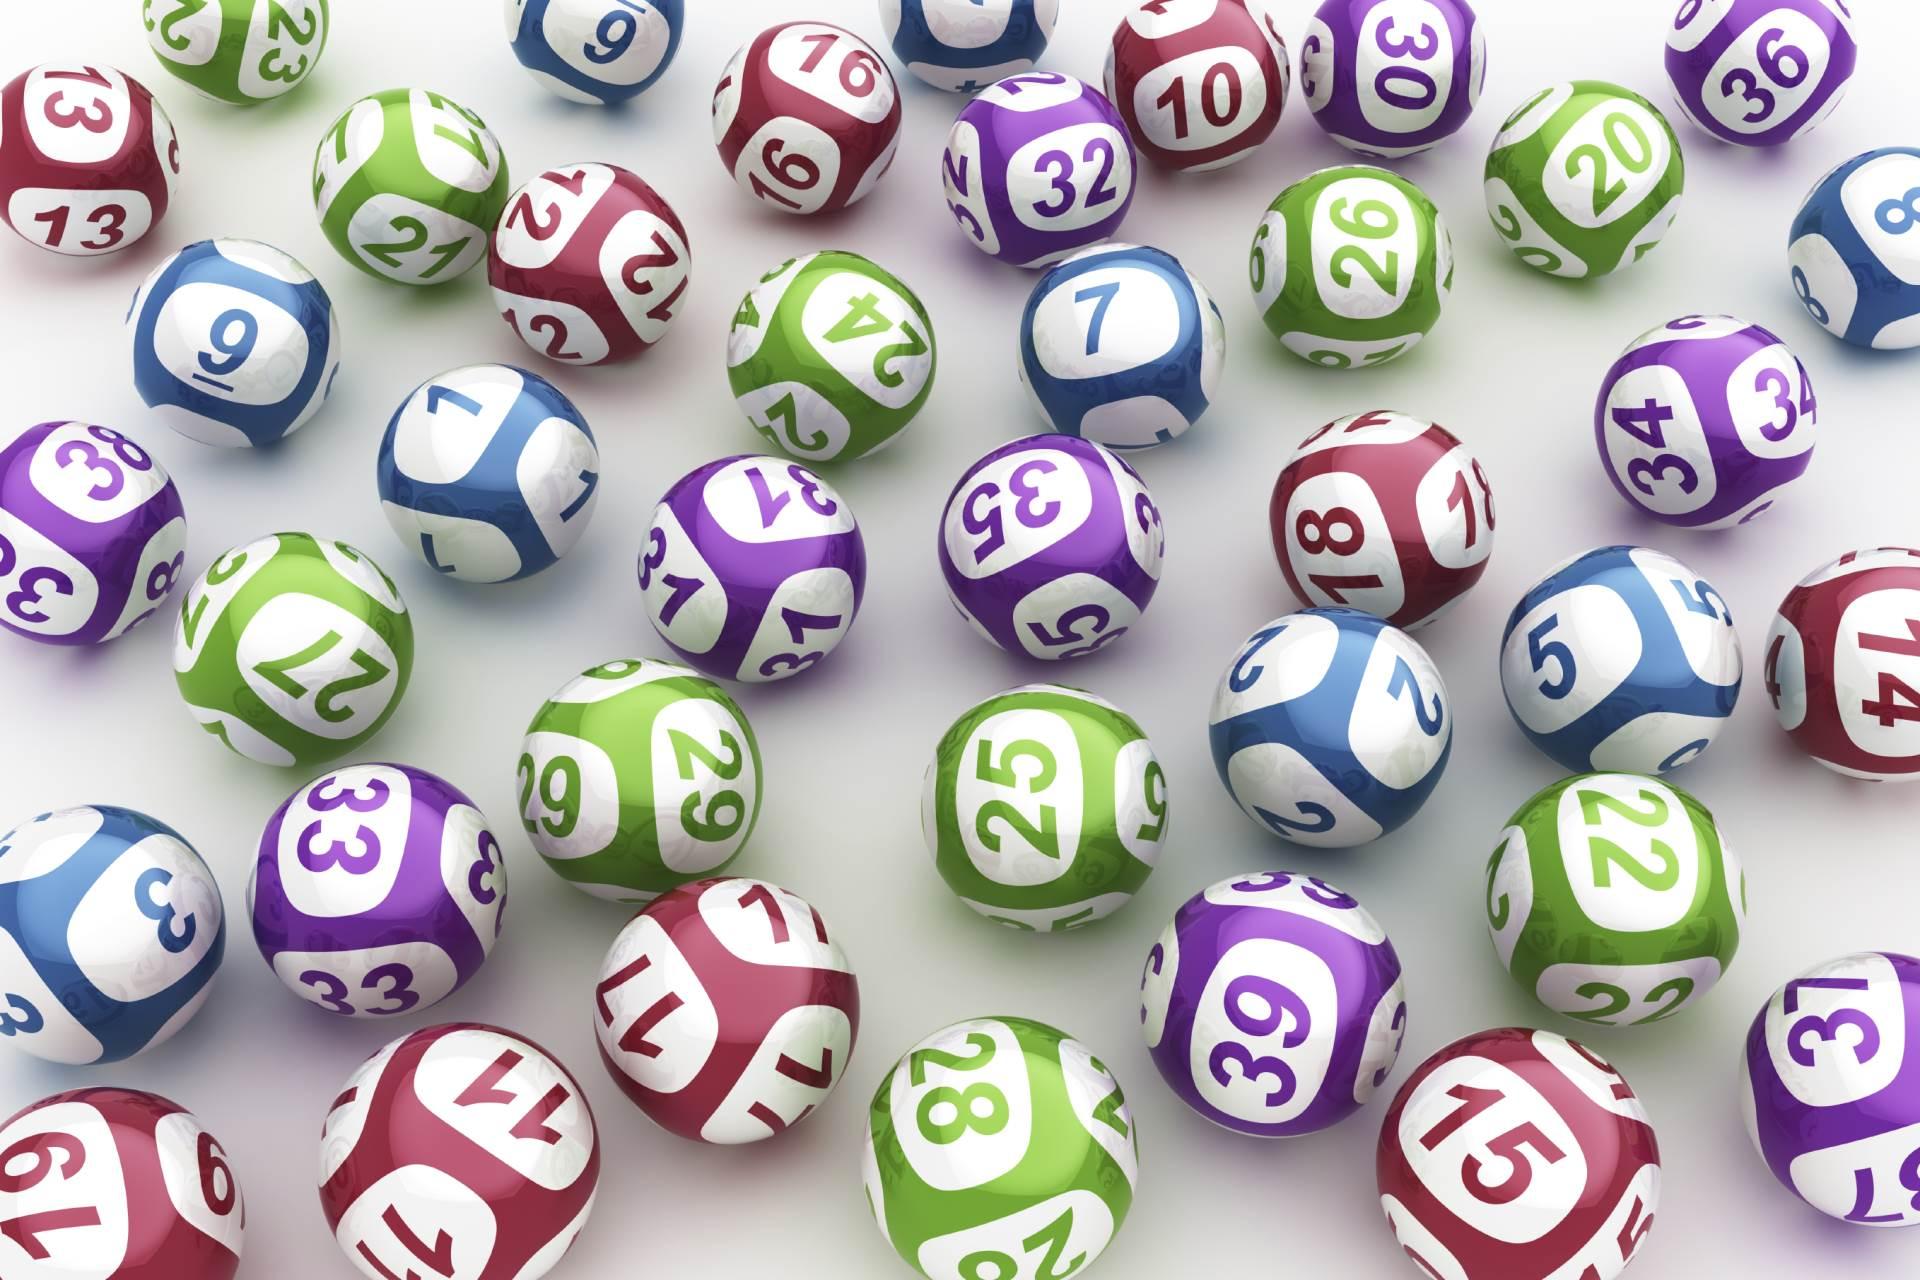 lutrija loto državna lutrija srbije igre na sreću bingo